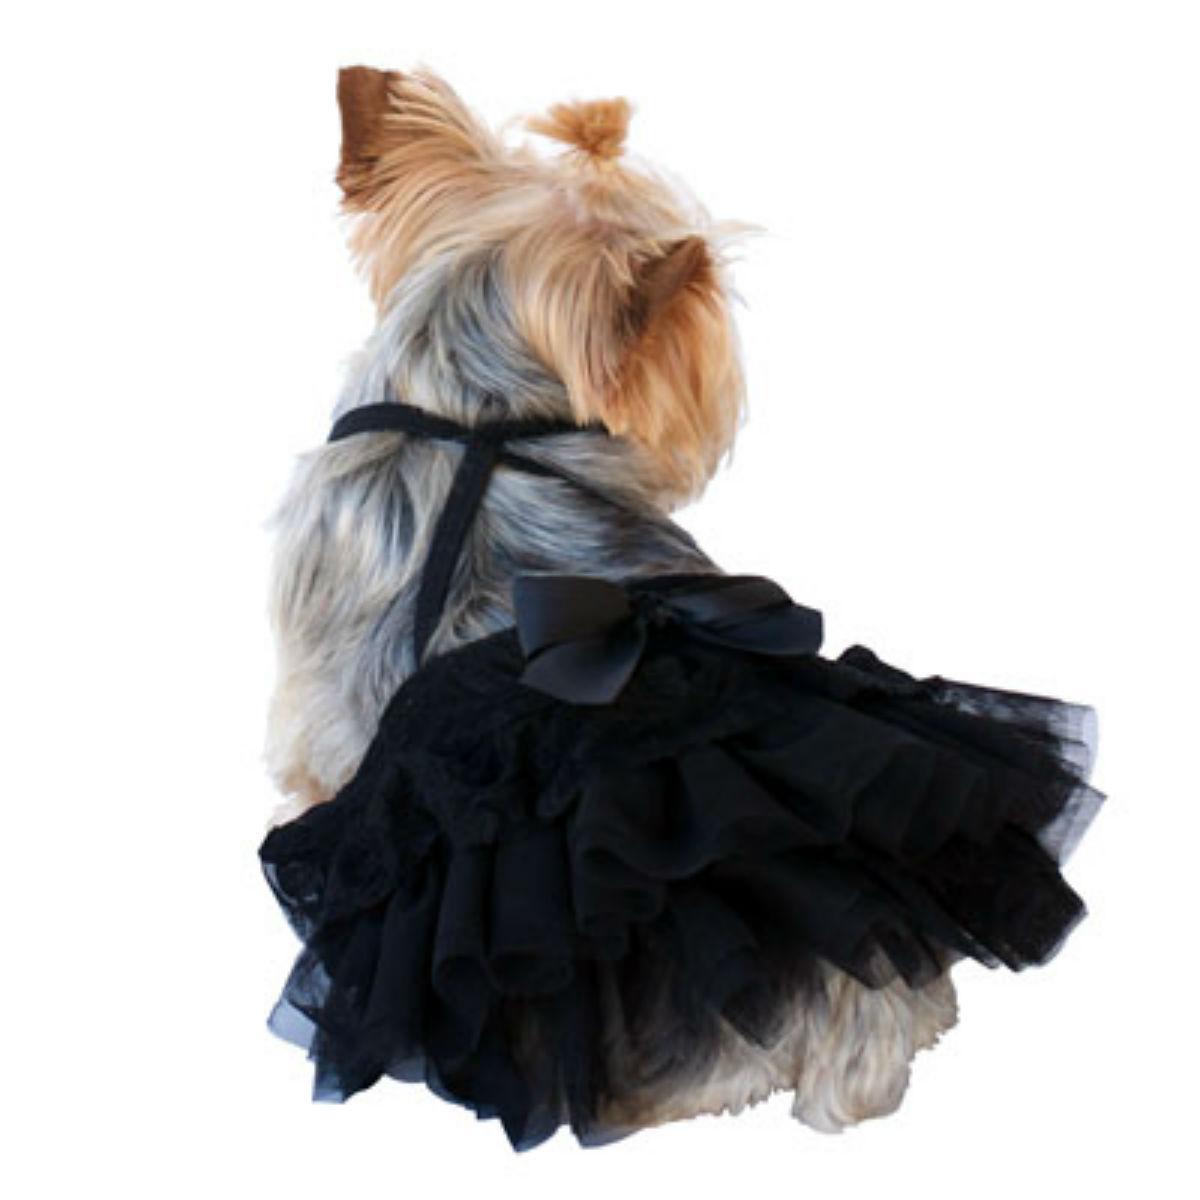 The Dog Squad's Cinema Dog Skirt - Black